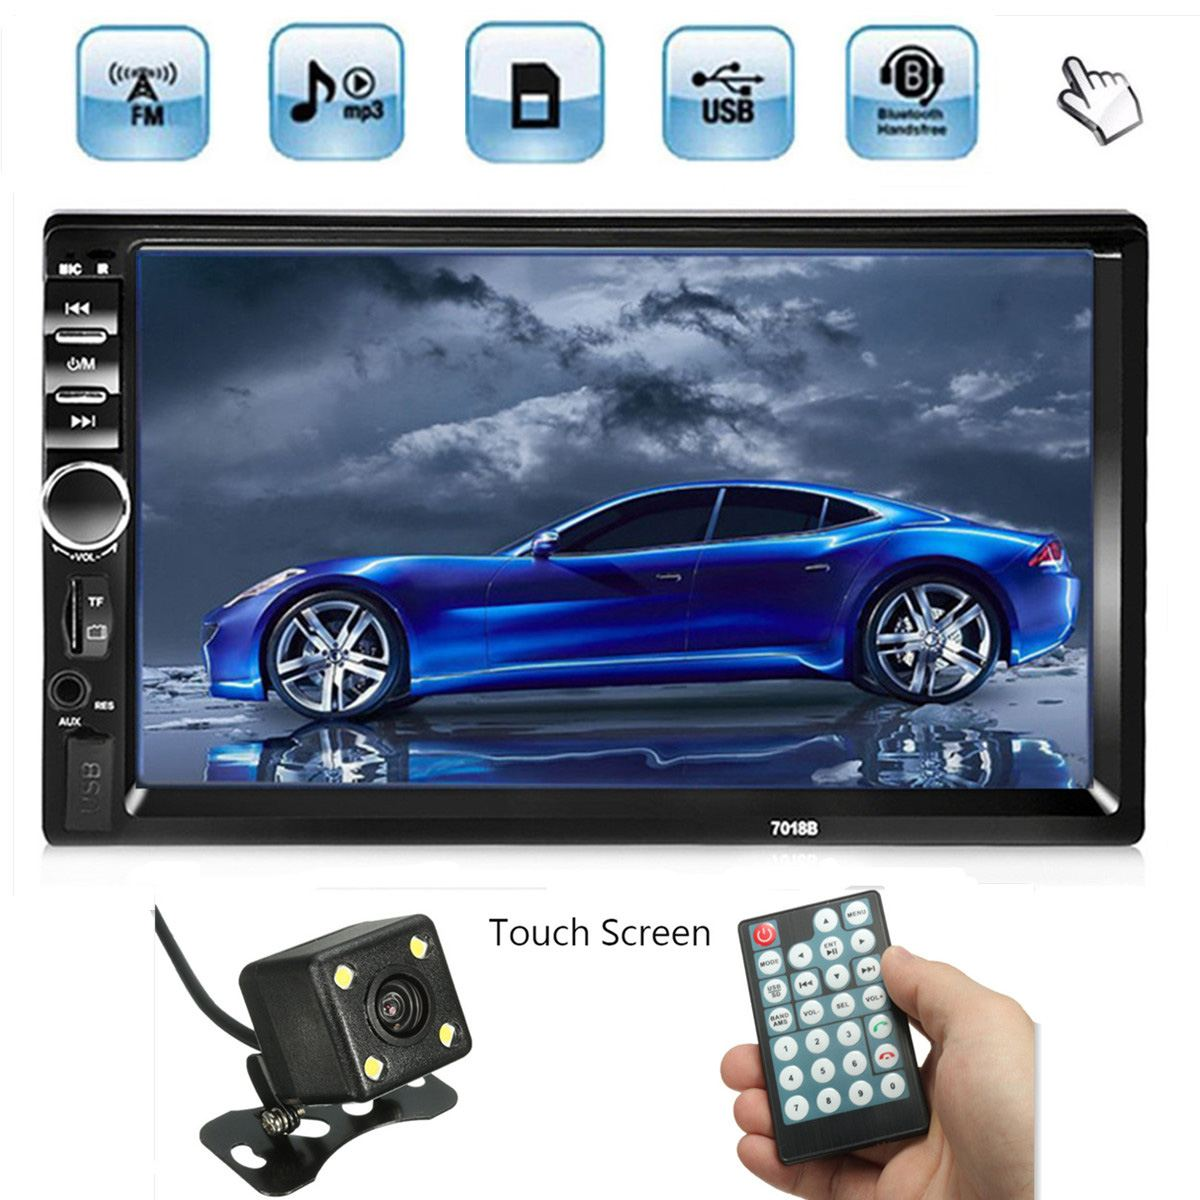 "Pantalla táctil HD de 7 "", bluetooth, reproductor de MP5 2 Din para coche con Radio ESTÉREO FM, AUX, USB SD, con cámara de visión trasera y mando a distancia"